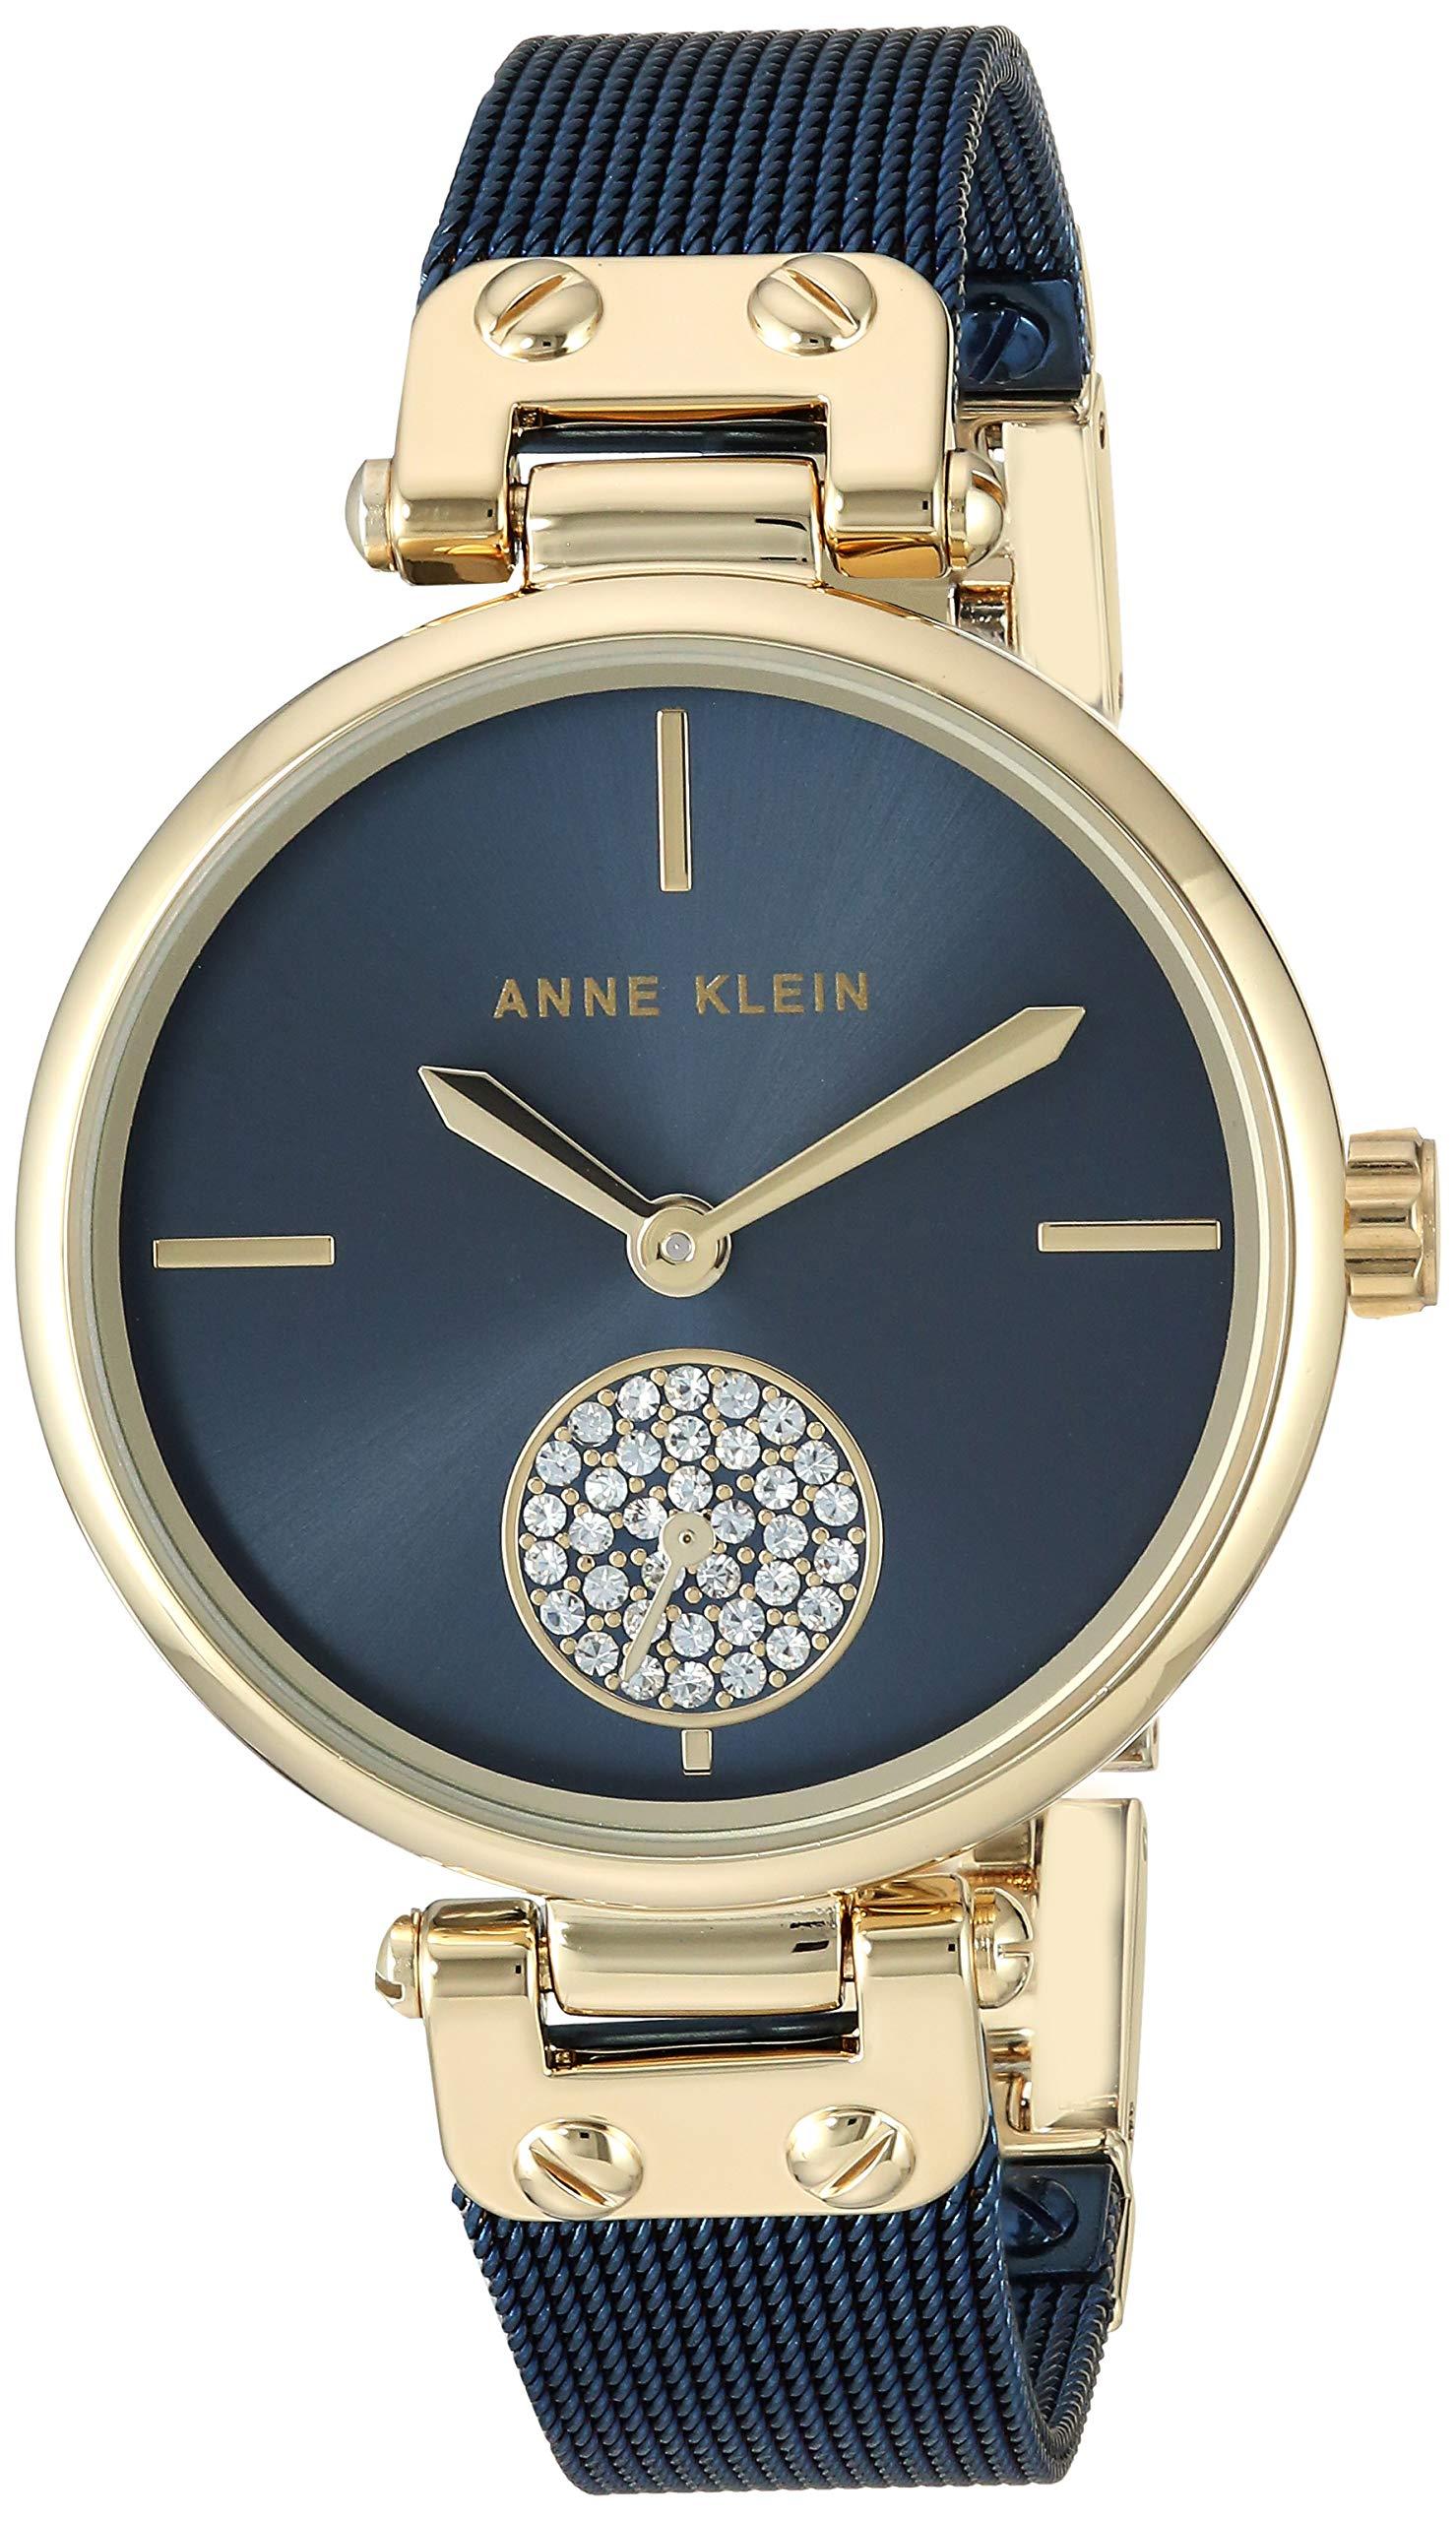 Anne Klein Women's AK/3001GPBL Swarovski Crystal Accented Gold-Tone and Blue Mesh Bracelet Watch by Anne Klein